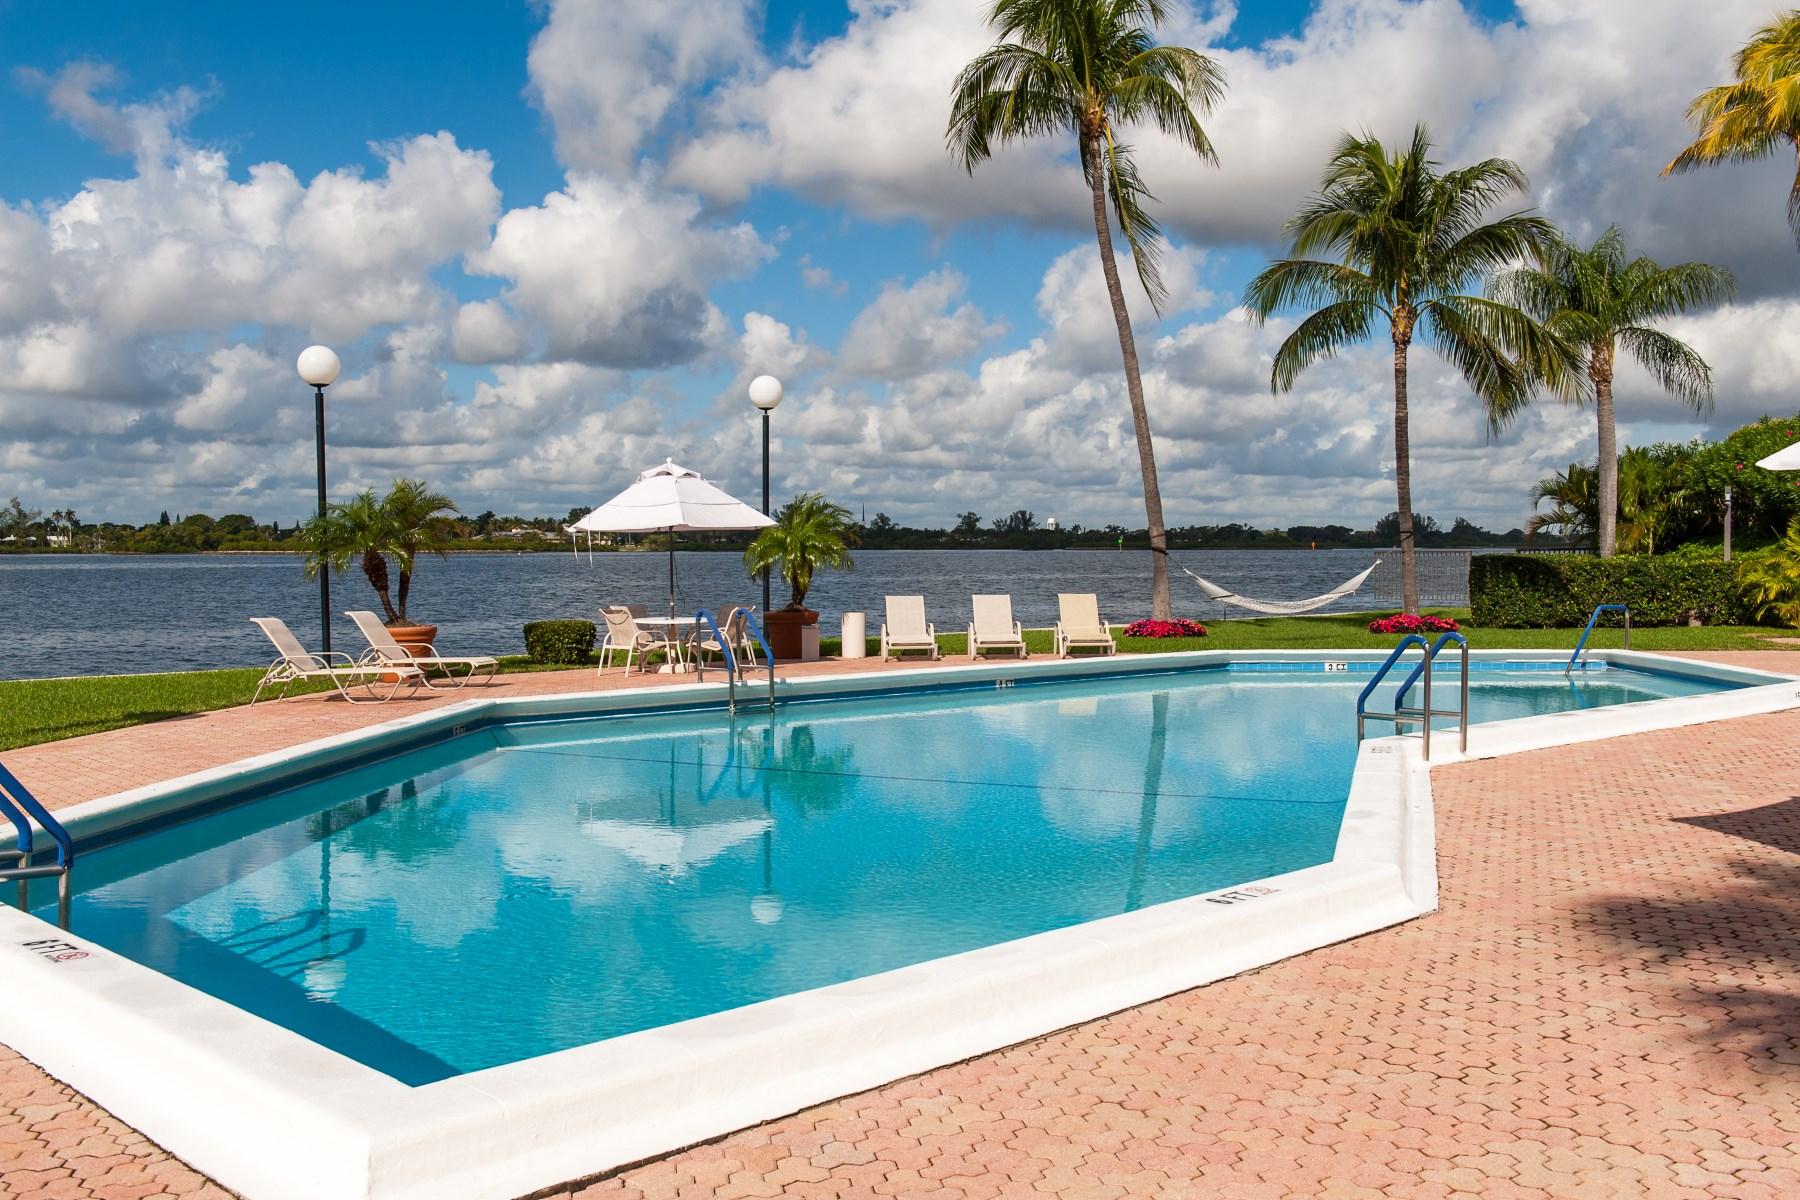 Condomínio para Venda às Sutton Place Three Bedroom Palm Beach 2778 S Ocean Blvd Apt 205s Palm Beach, Florida 33480 Estados Unidos